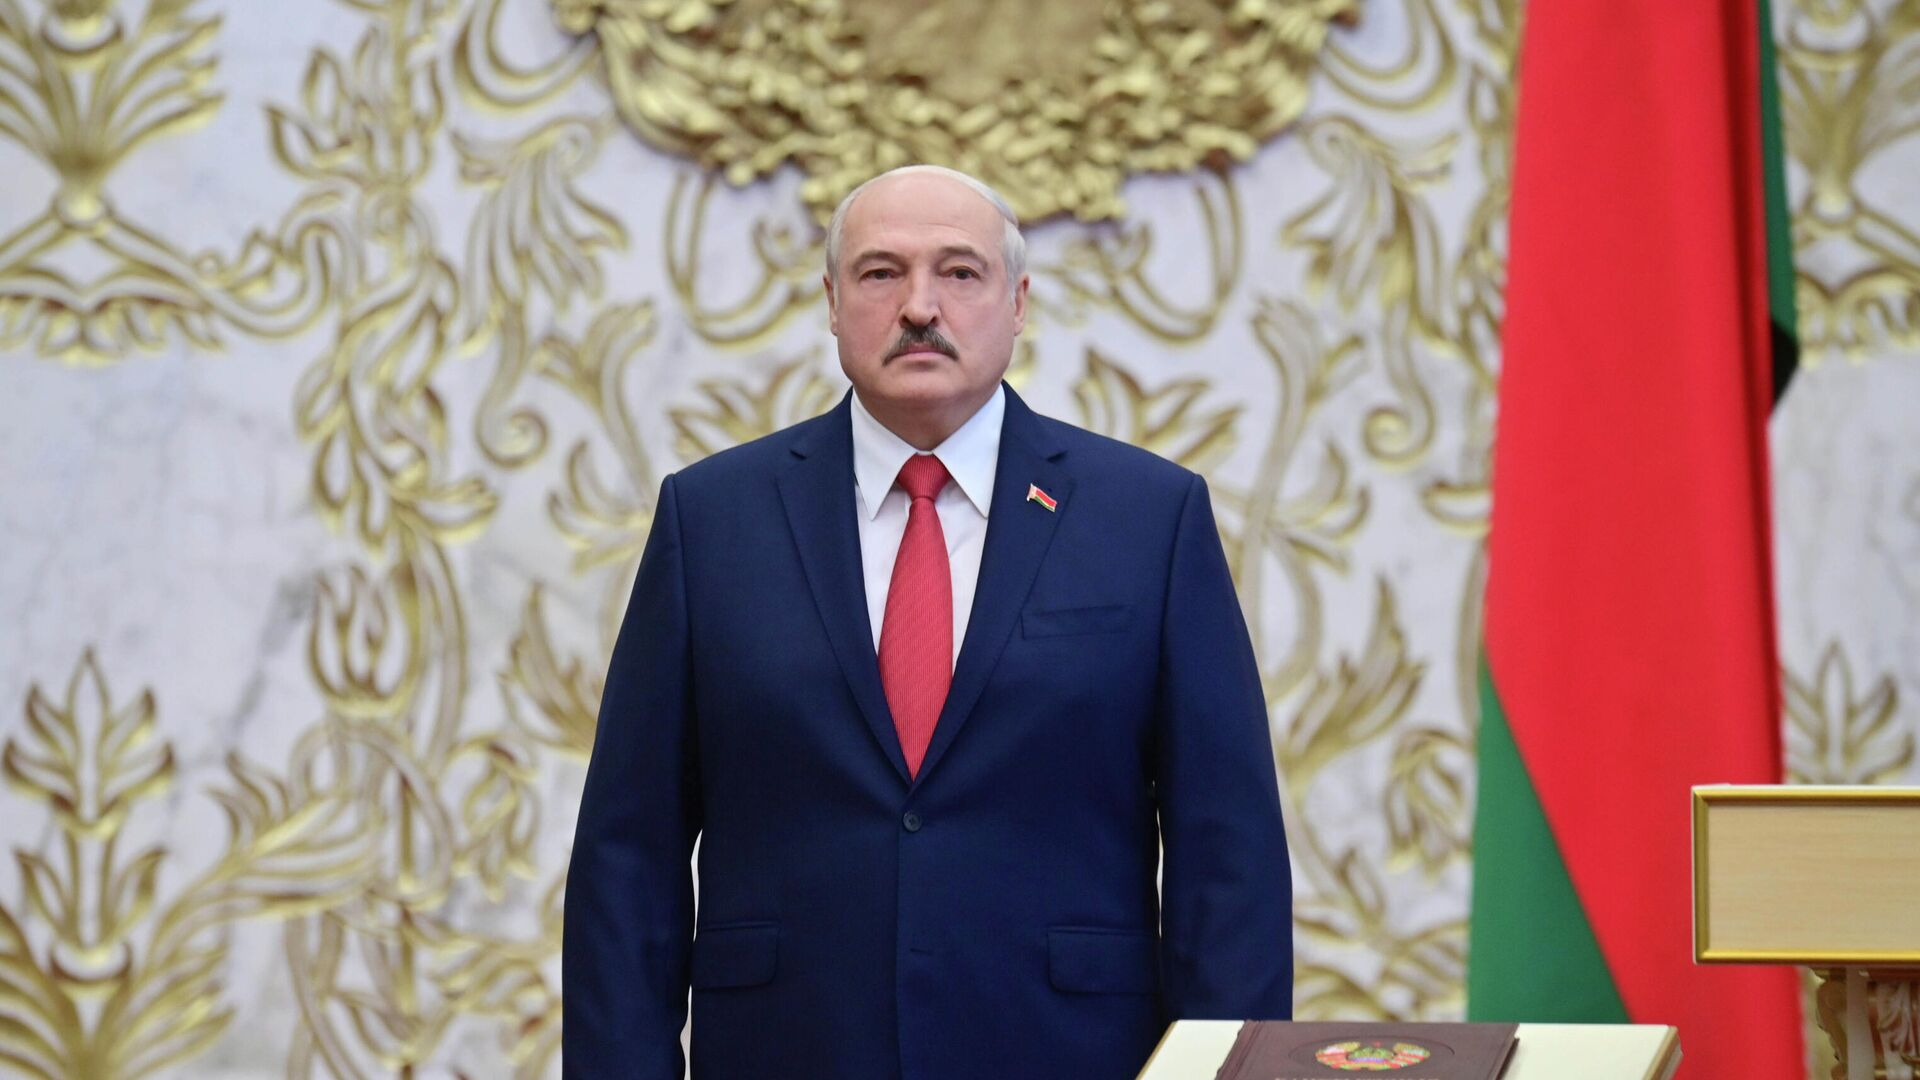 Президент Белоруссии Александр Лукашенко на церемонии инаугурации в Минске - РИА Новости, 1920, 13.11.2020